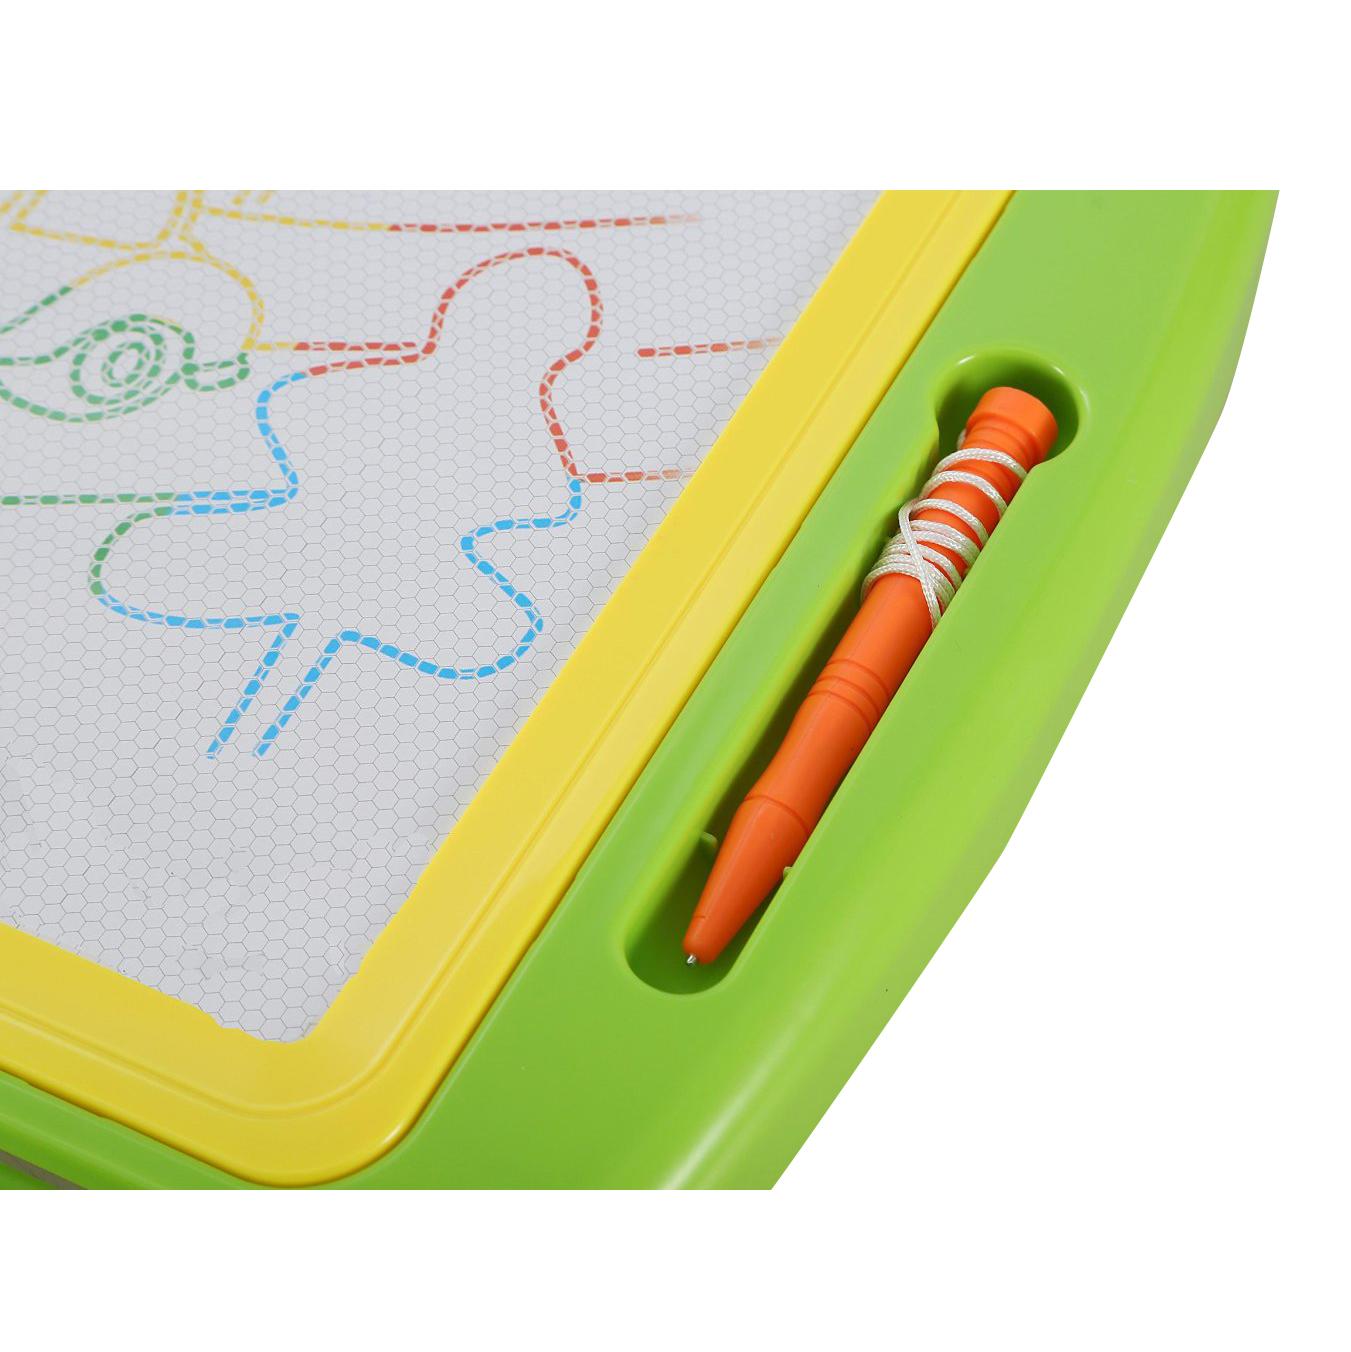 magnetic drawing board large size doodle sketch kids educational toys sn. Black Bedroom Furniture Sets. Home Design Ideas